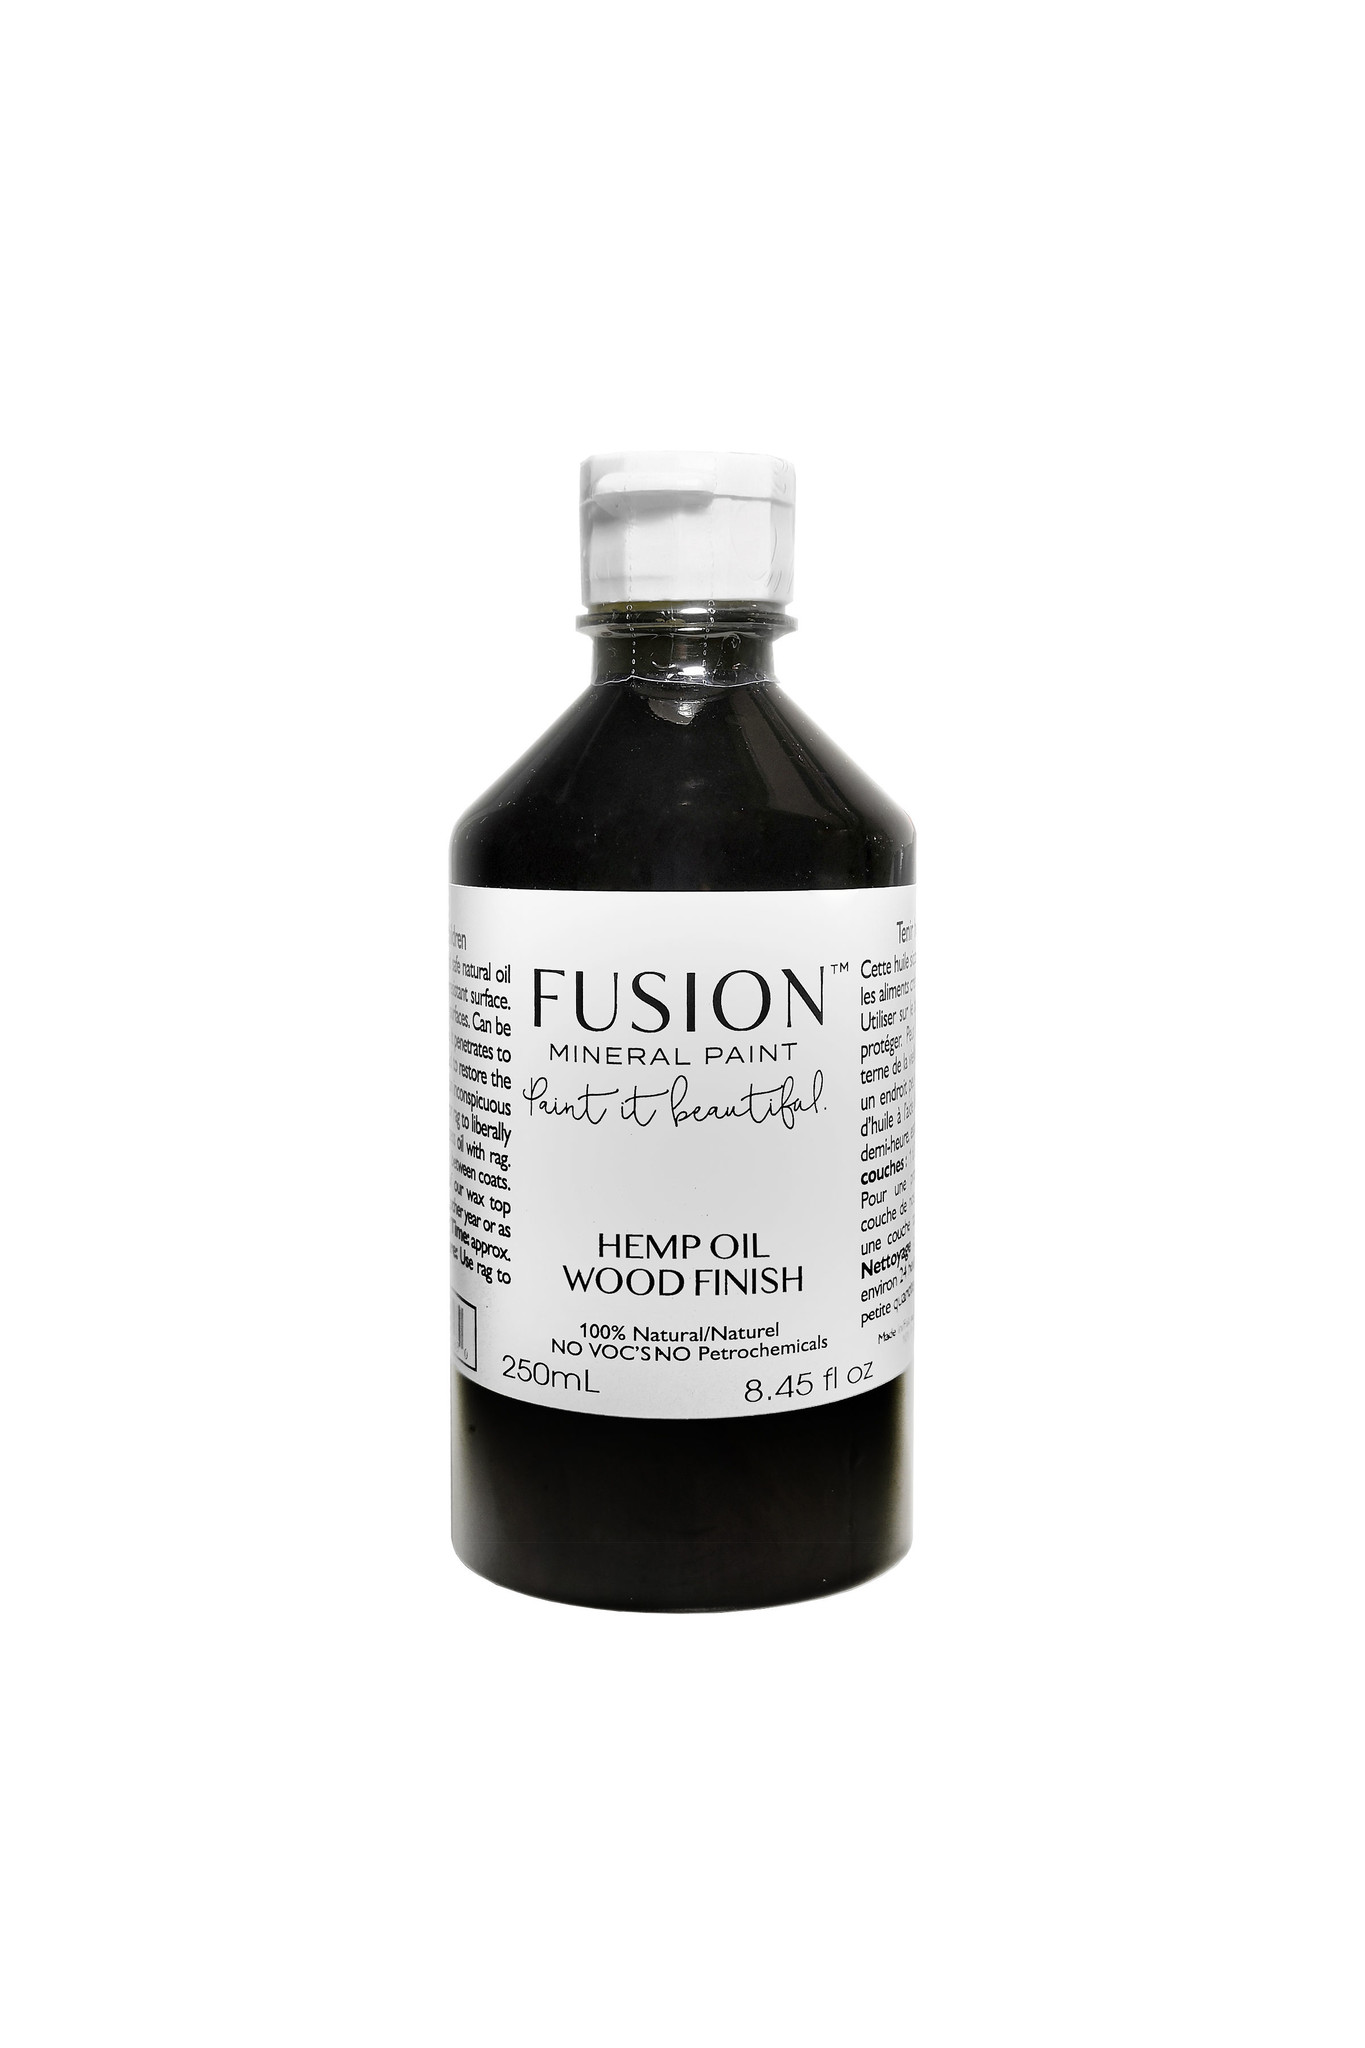 Fusion Mineral Paint Fusion - Hemp Oil - 250ml